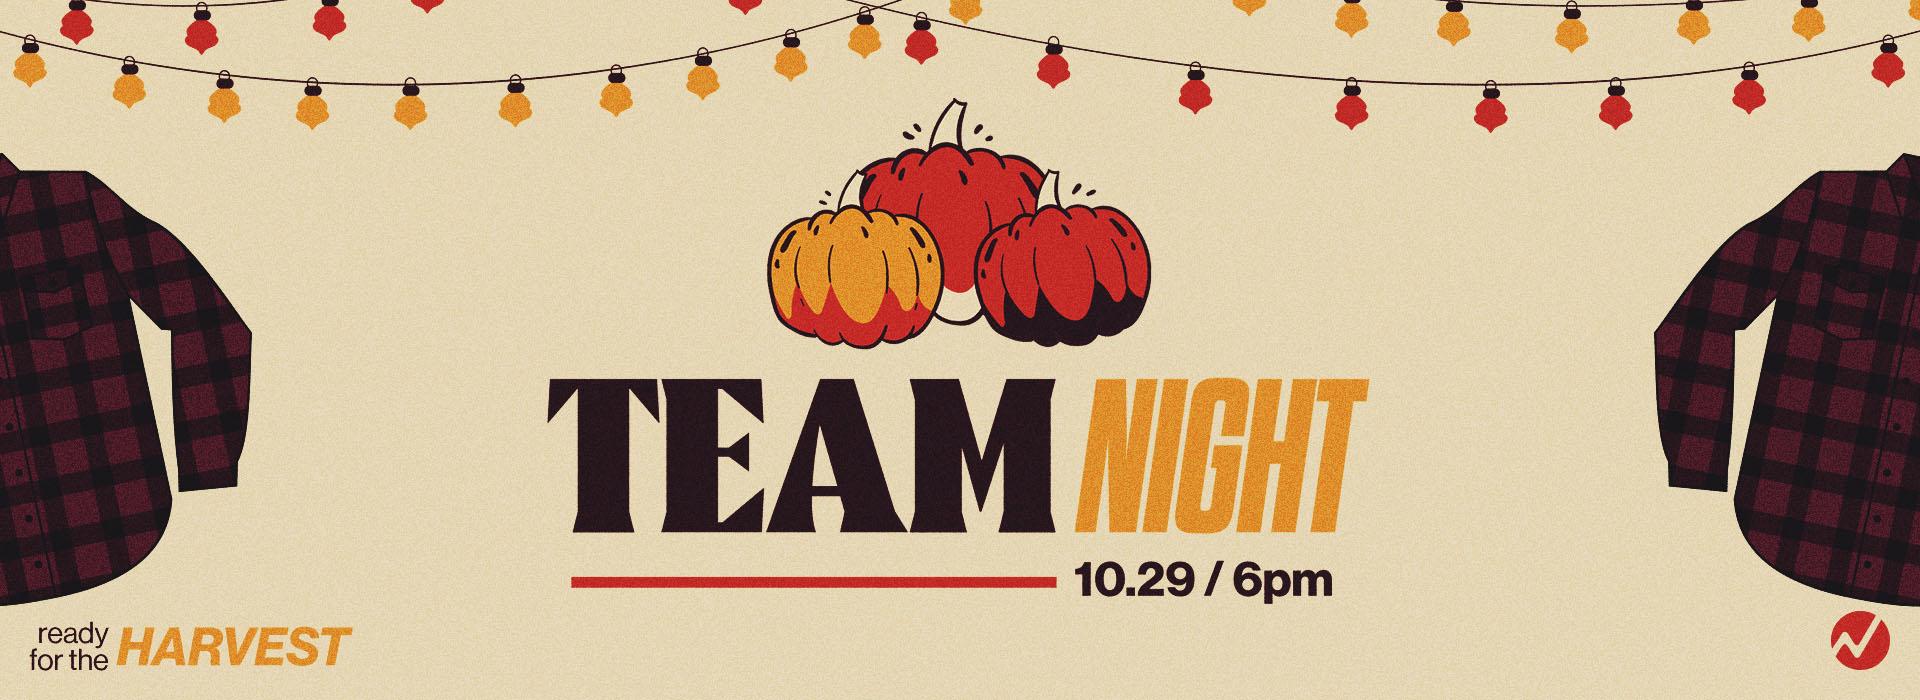 Team Night - Concepts 2 - 1920x700